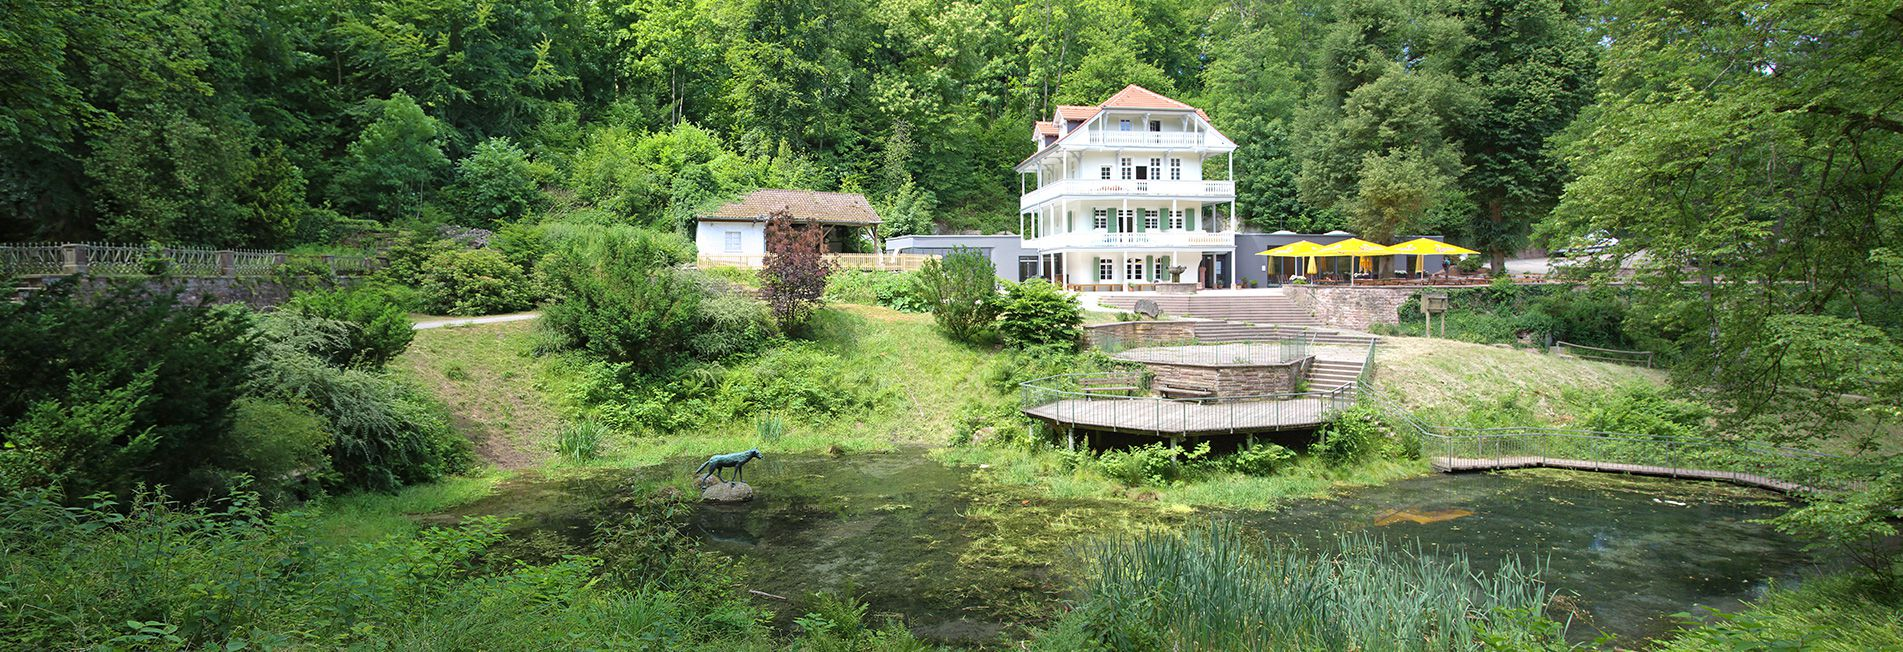 lanedgasthof heidelberg und umgebung